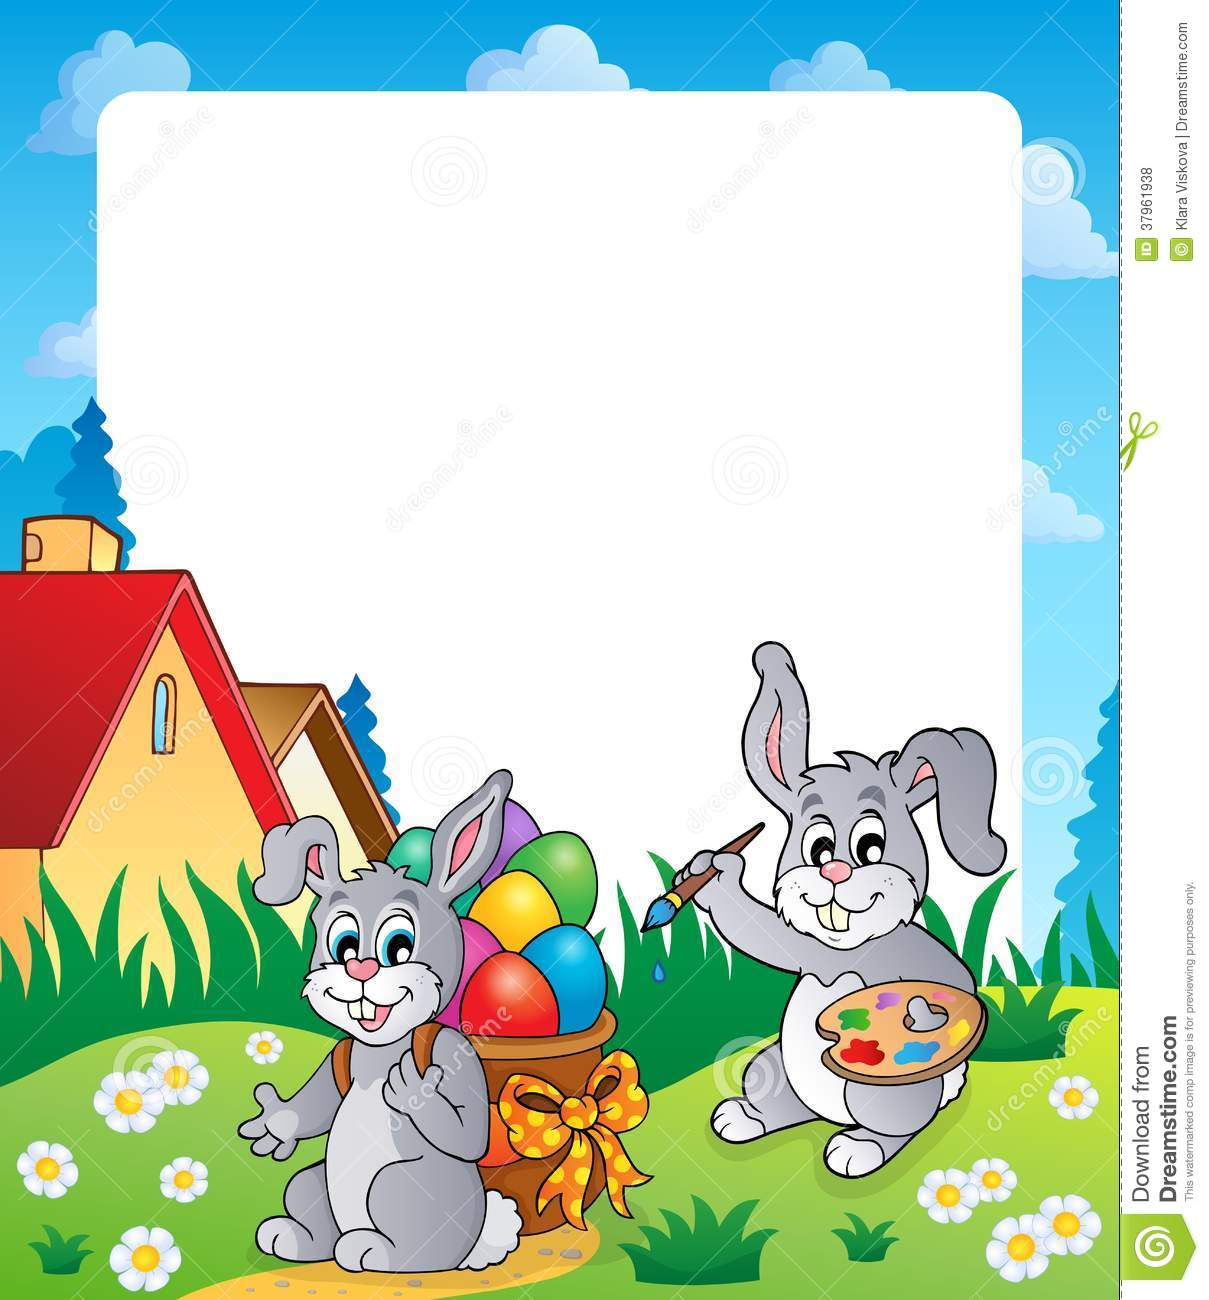 18 Easter Bunny Vector Border Images - Vector Easter Bunny Border ...